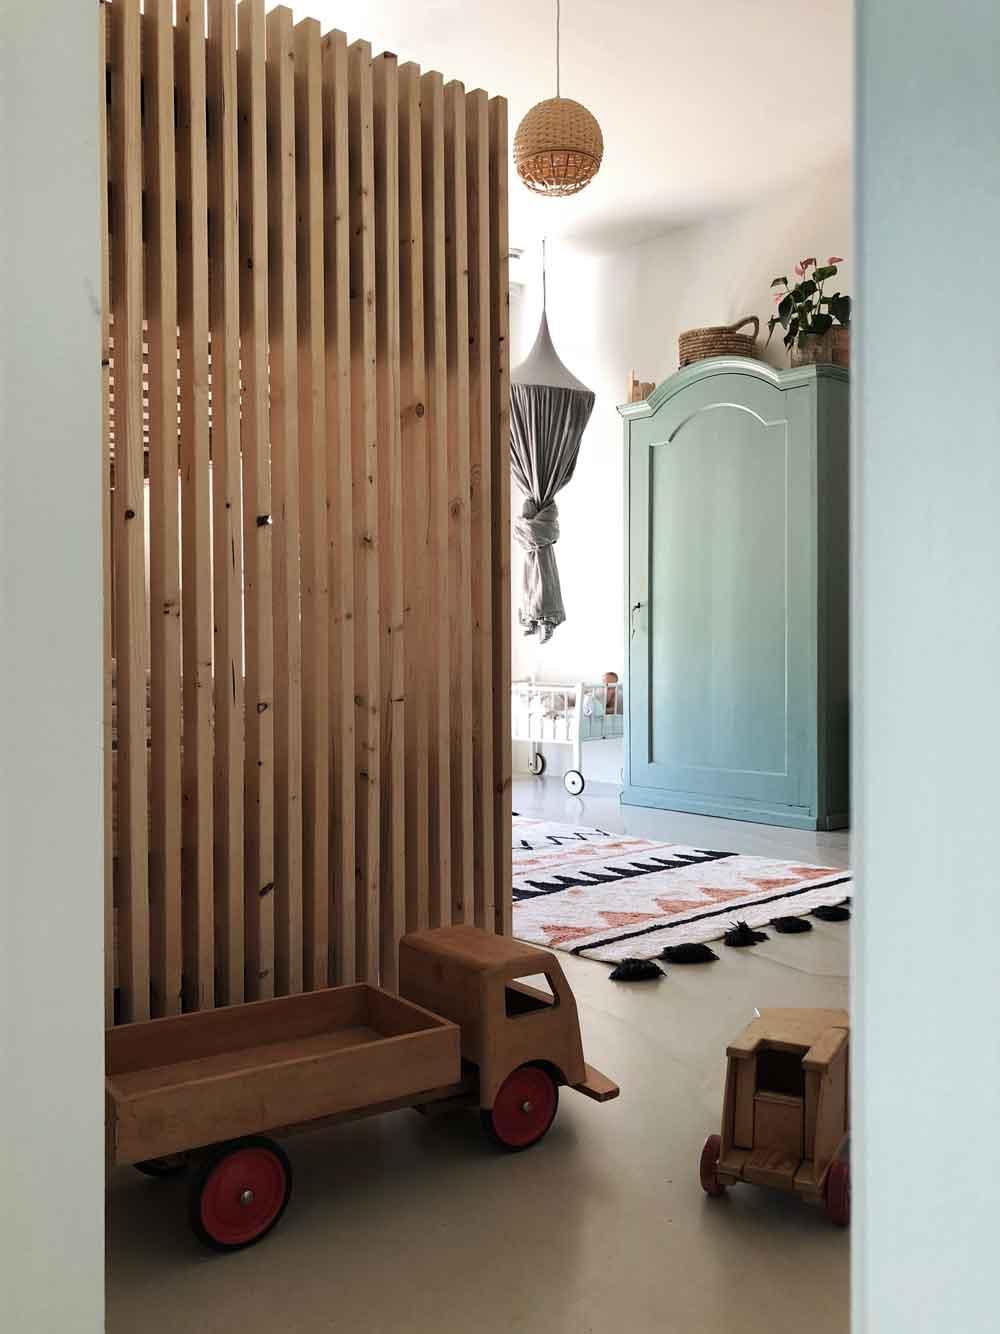 Stockbett Kinderzimmer vintage Holzbett Holzmoebel - DIY | ein Stockbett aus Holz einfach selber machen